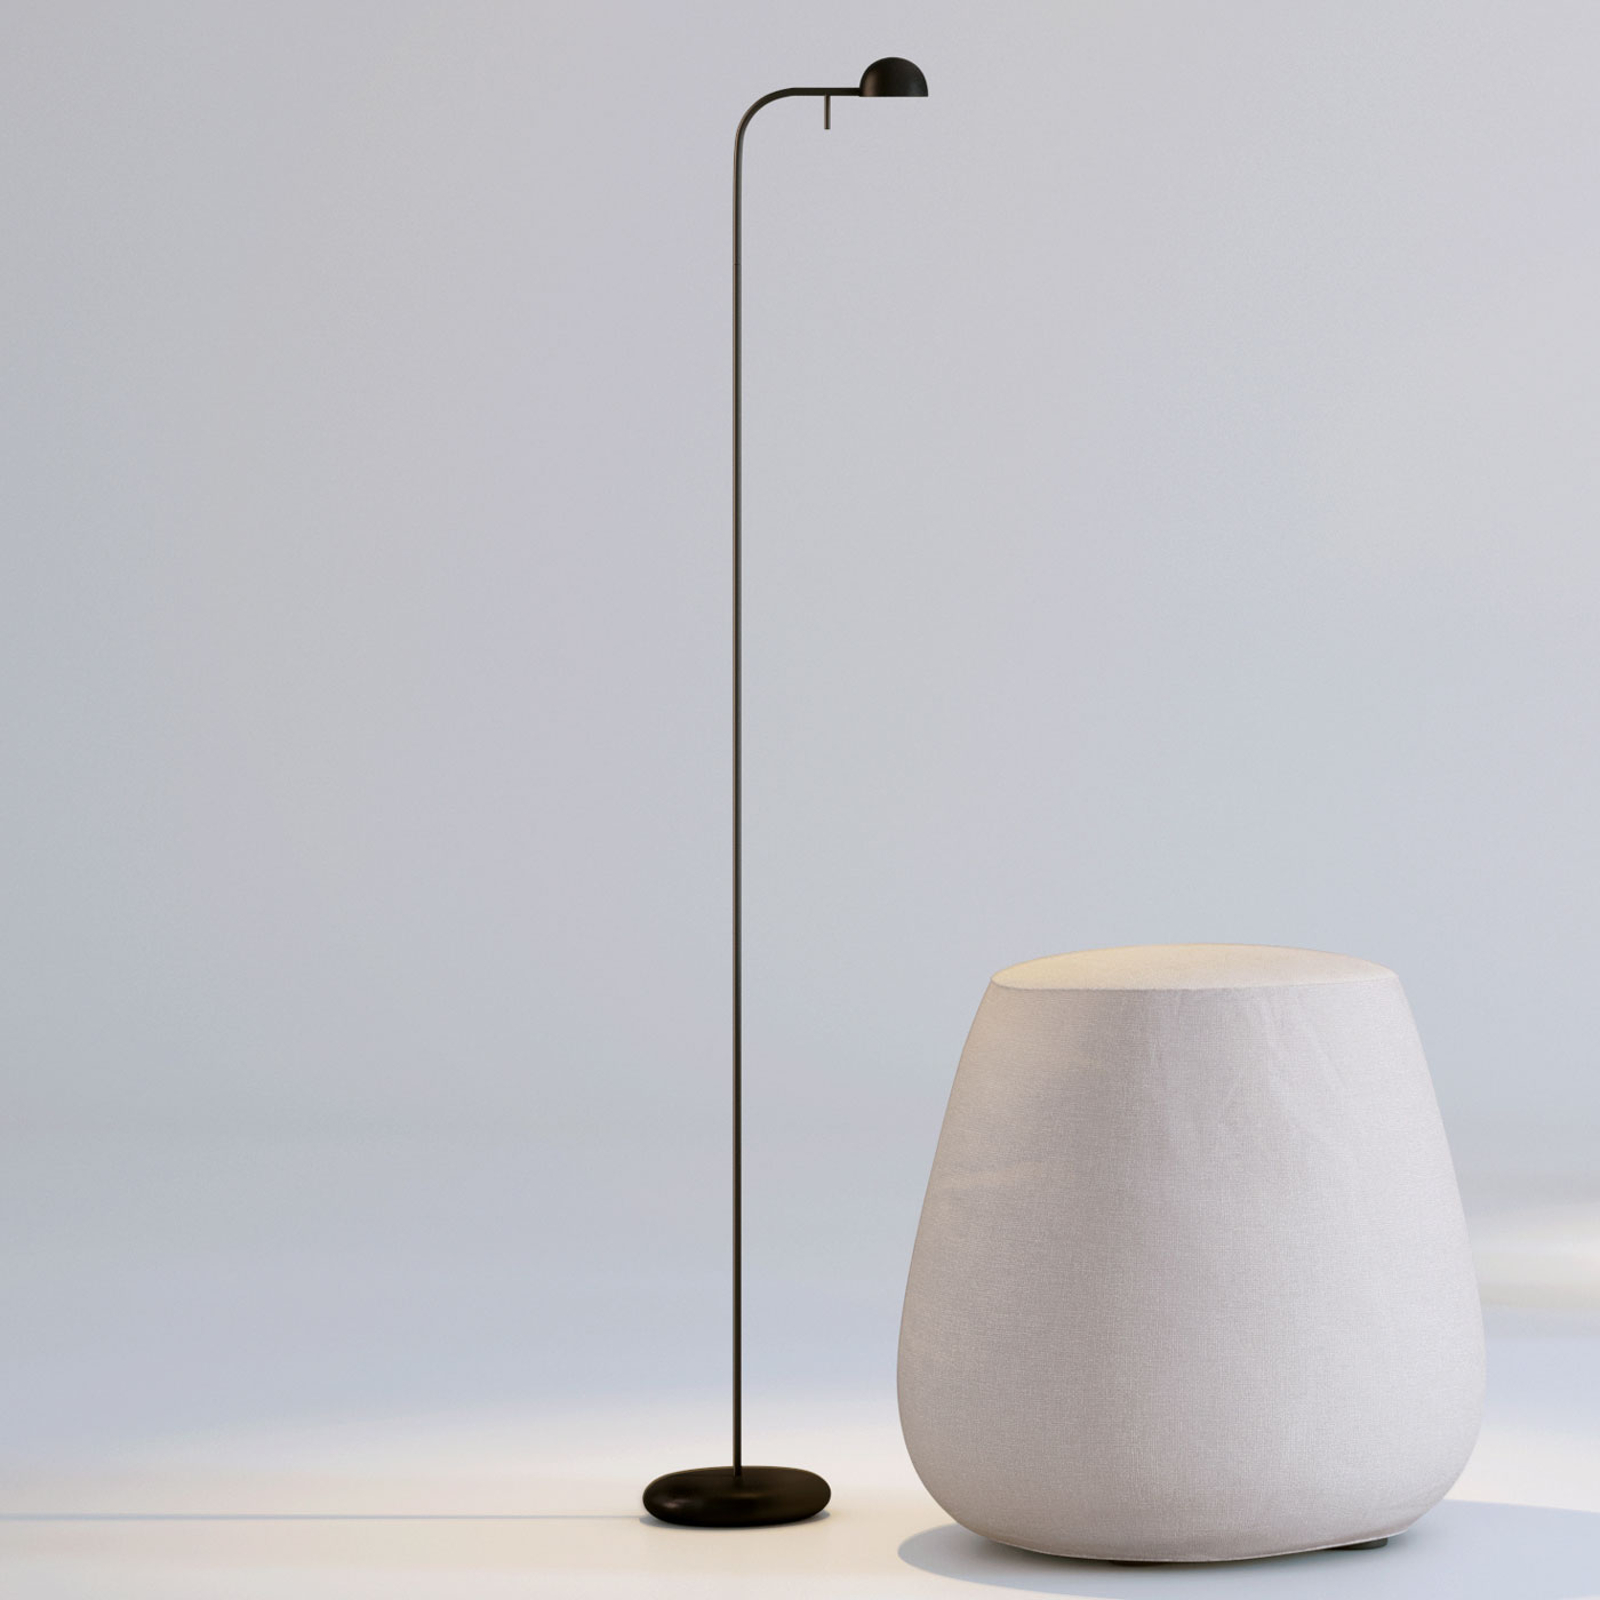 Vibia Pin 1660 lampa stojąca LED, 125 cm, czarna